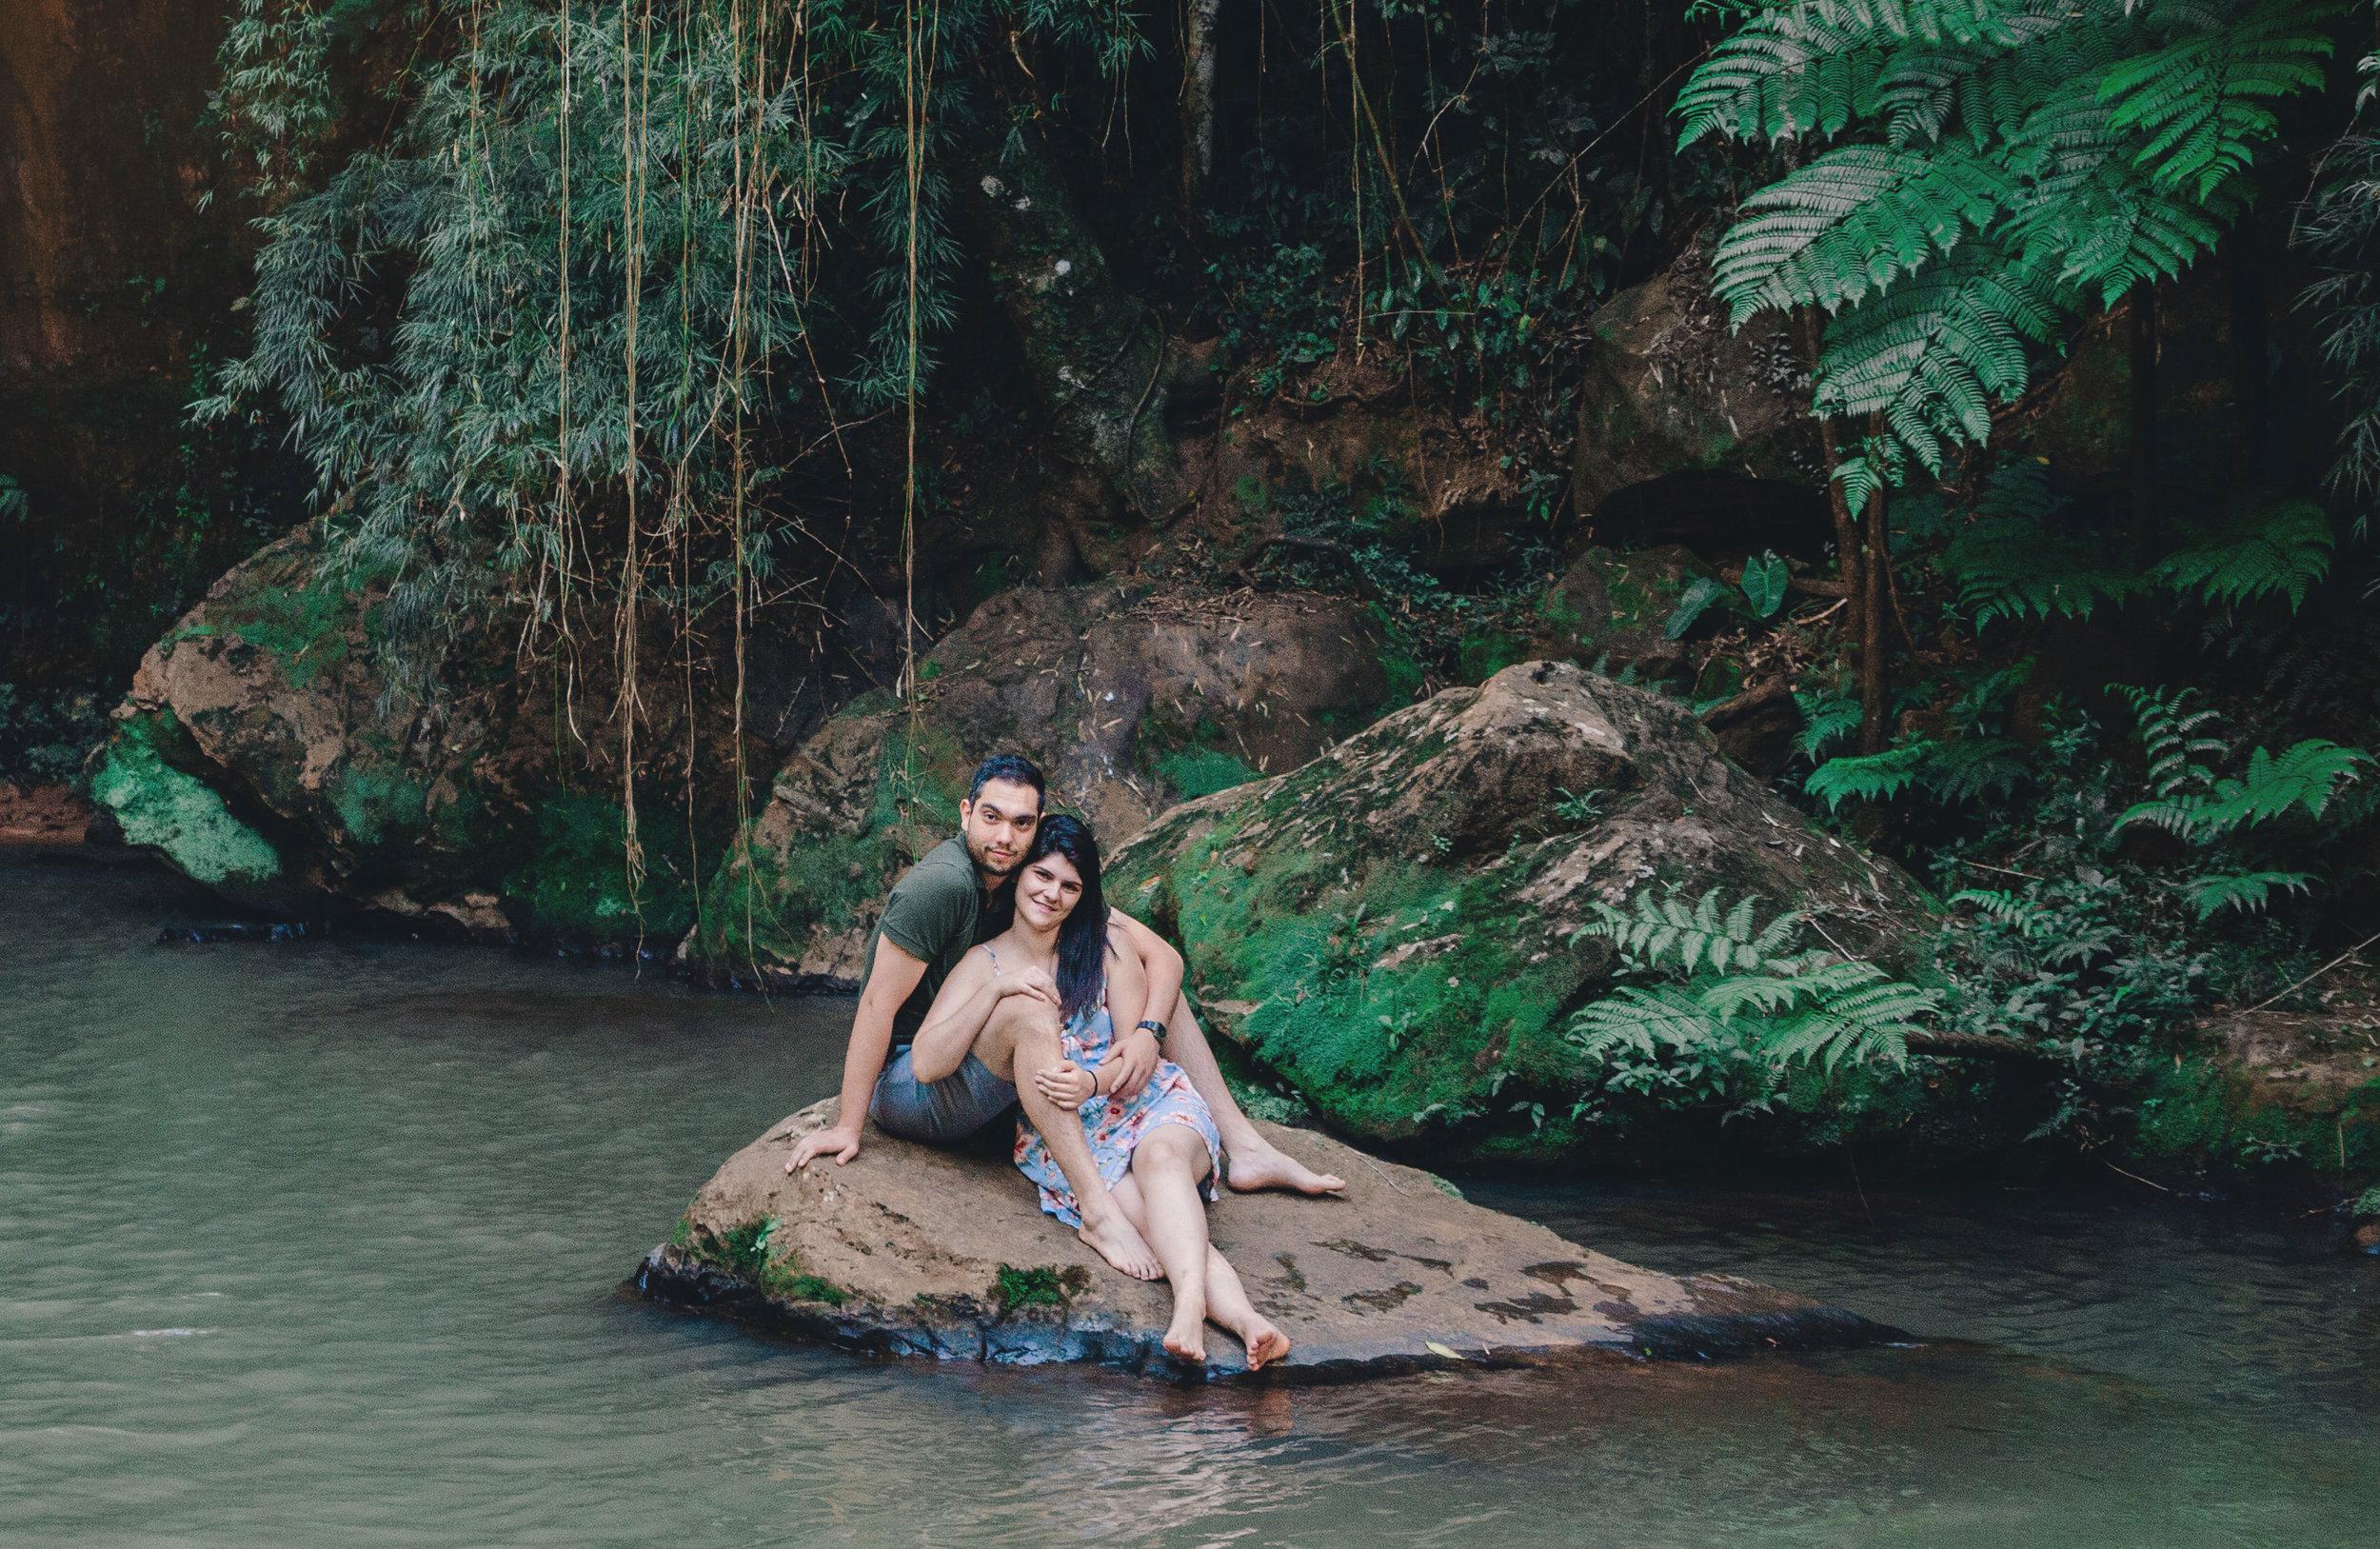 Destination wedding adventure photographer Iceland Hawaii Brazil waterfall David and Gabriela (7).jpg